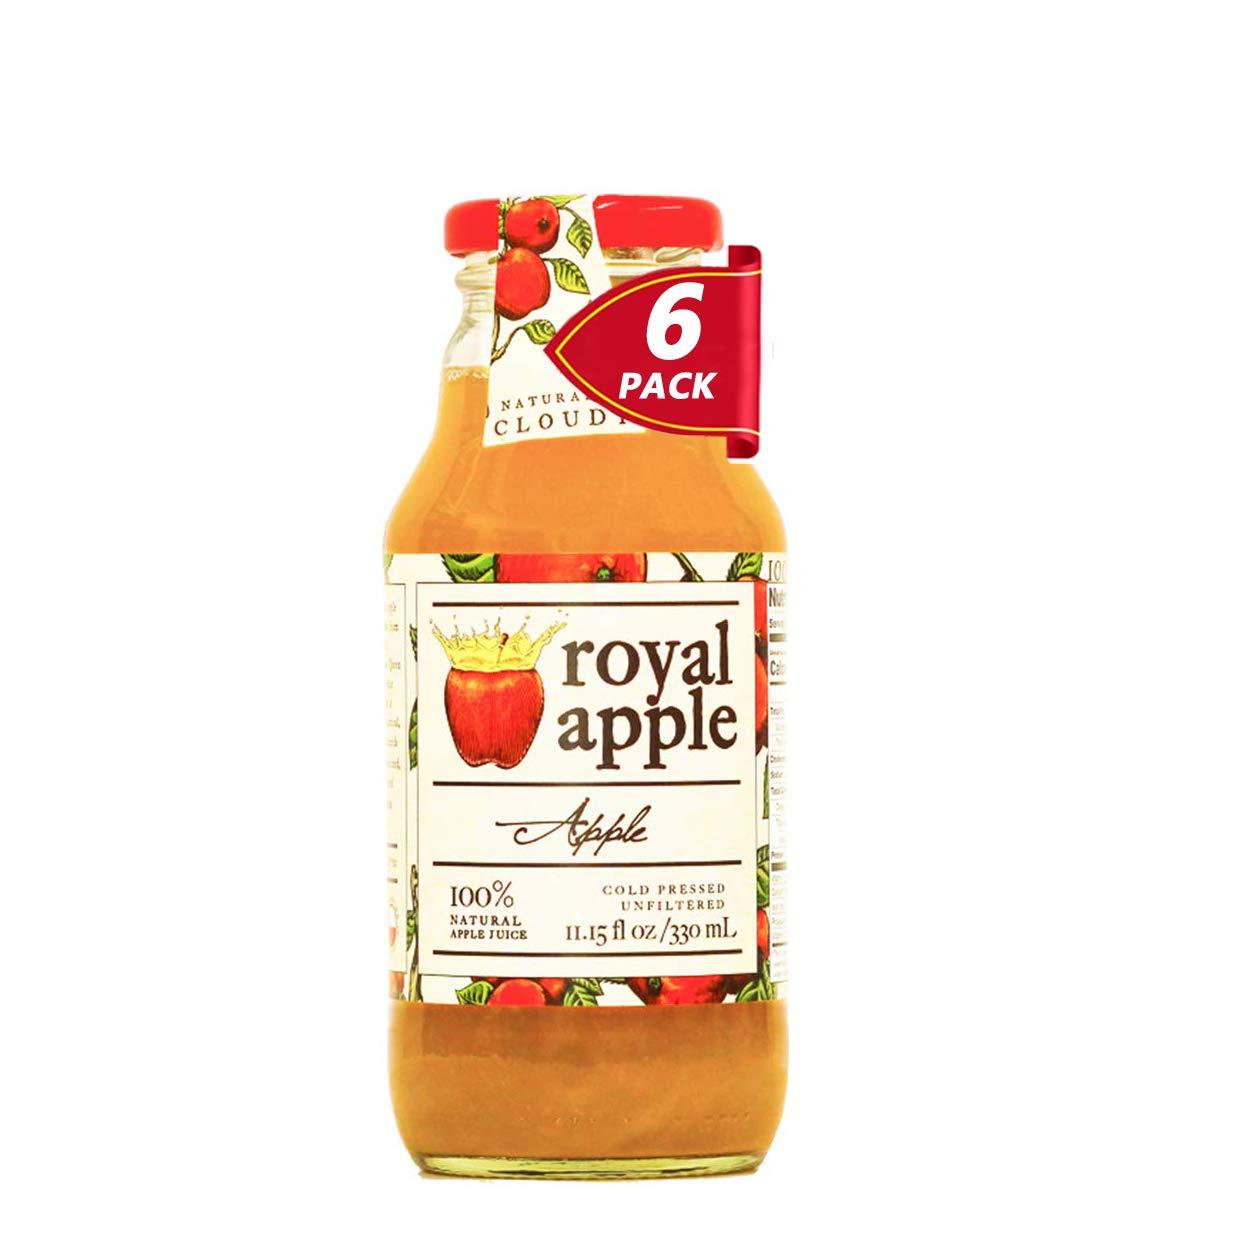 Royal Apple Pure Premium 100% Natural Apple Juice | No Sugar Added, Non-GMO, No Preservatives, Good Source of Vitamin C Source, Healthy Kids Juice Drink, 11.15 fl oz (330mL), 6 Pack